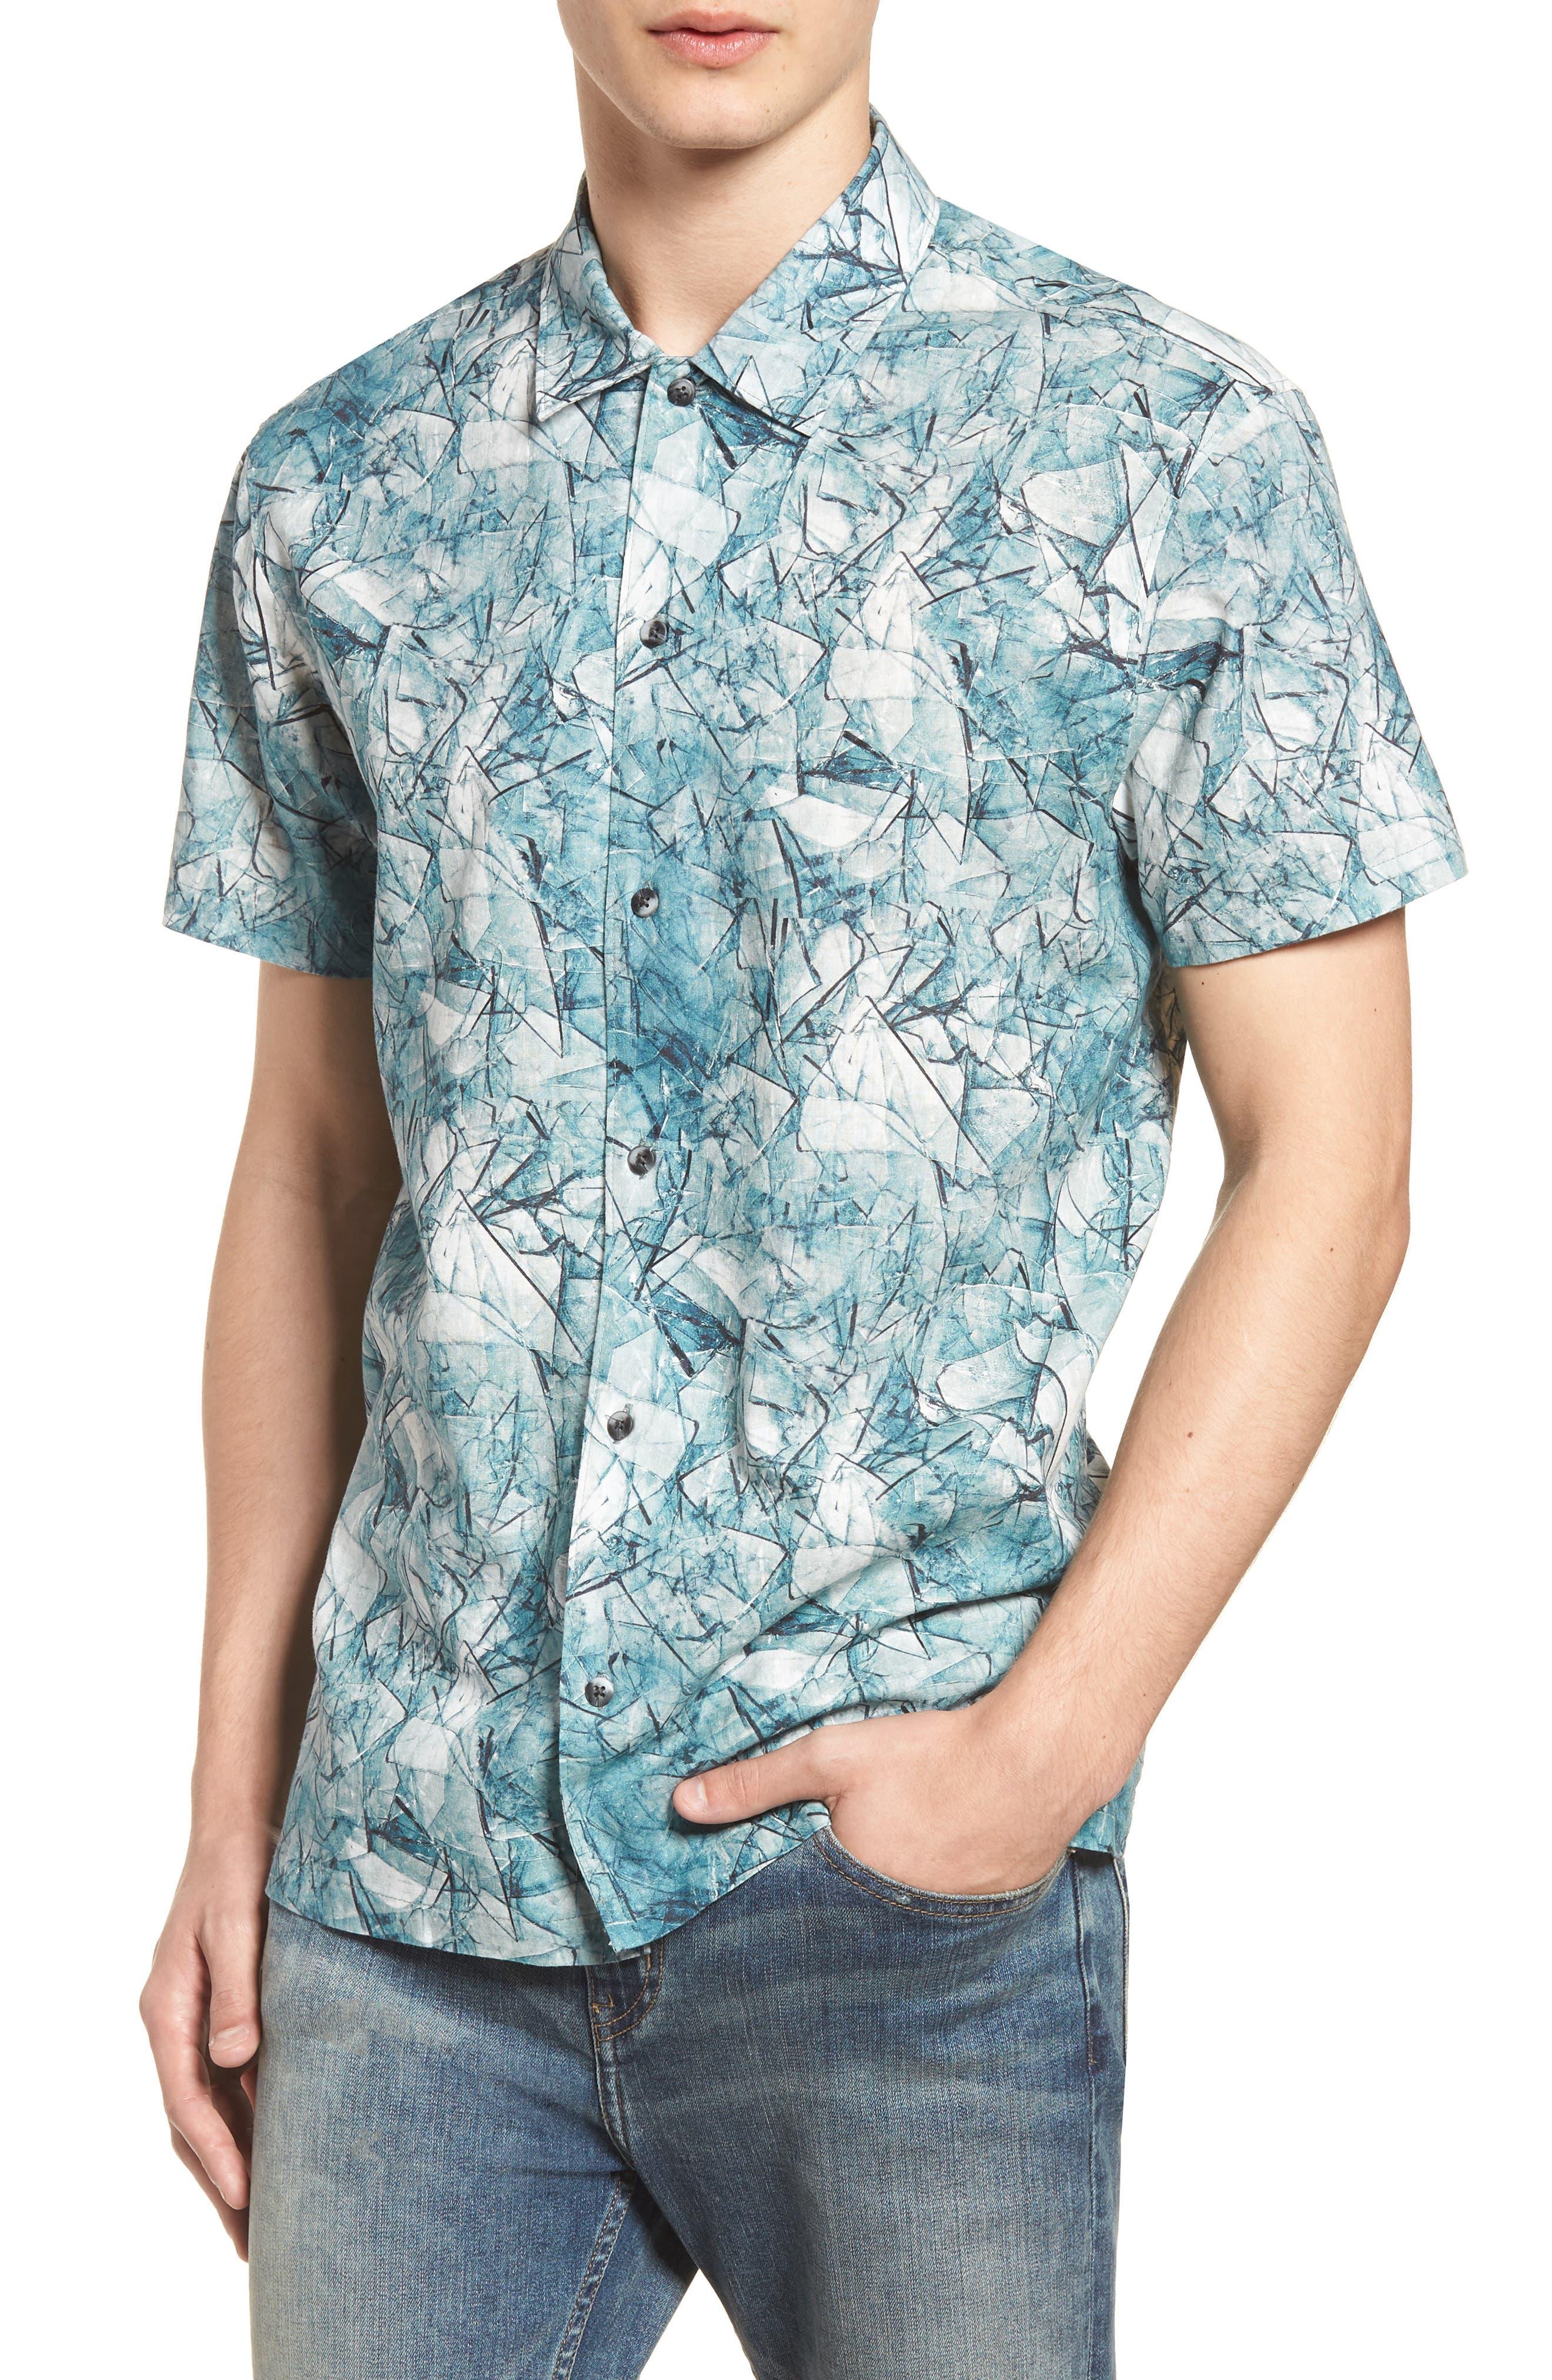 Shoto Short Sleeve Shirt,                             Main thumbnail 1, color,                             SHATTERED BLUE